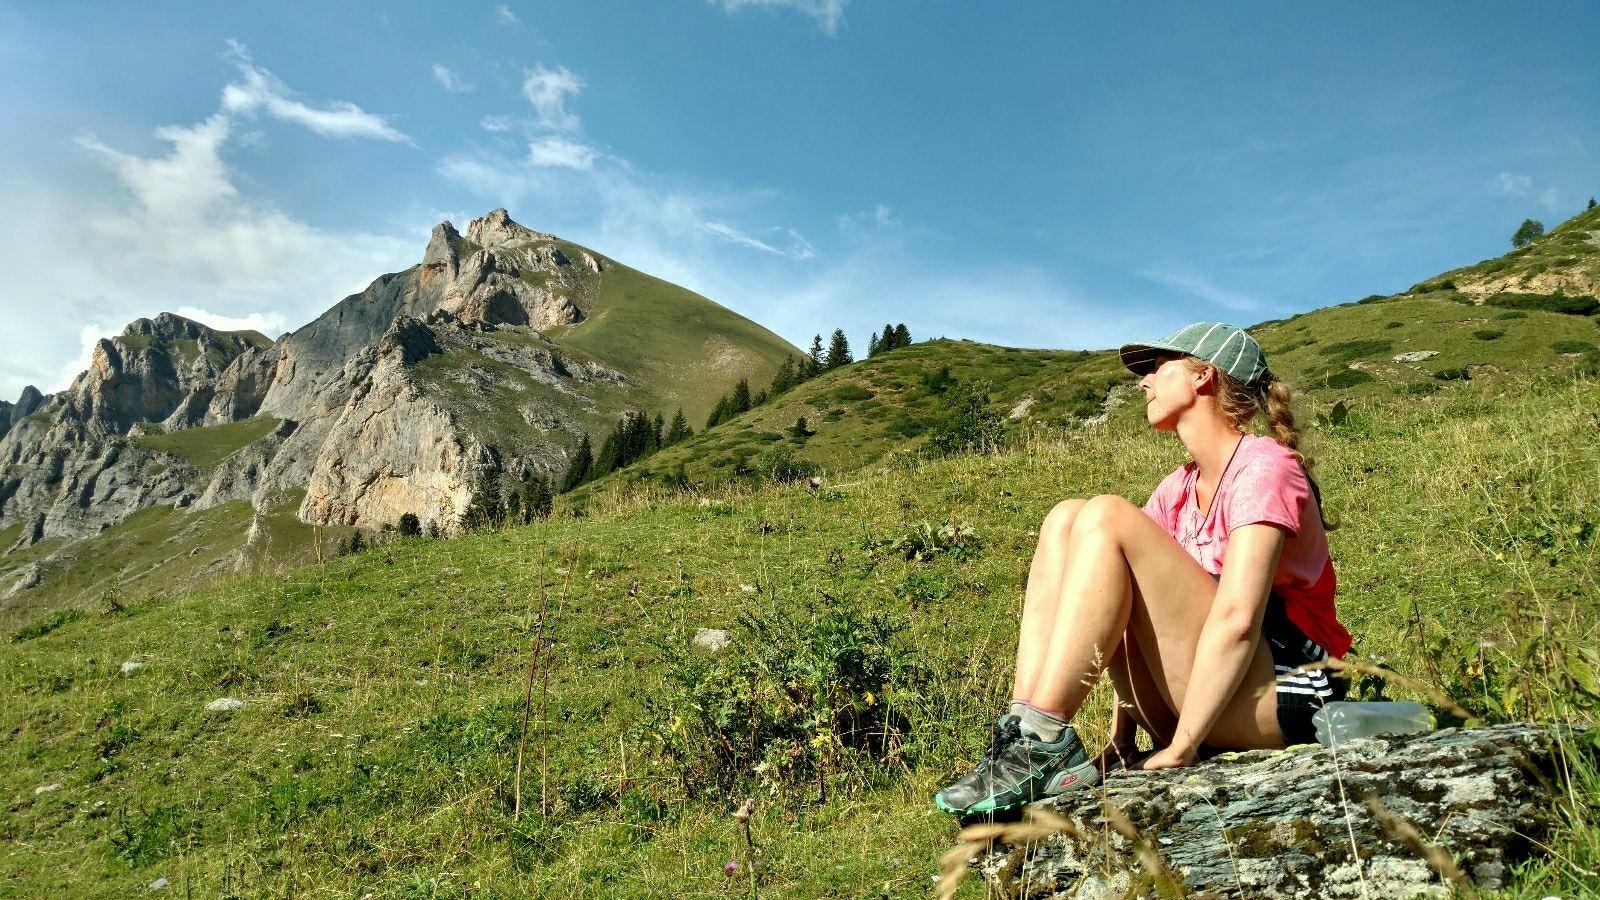 Lower Leshnica and Plat peak